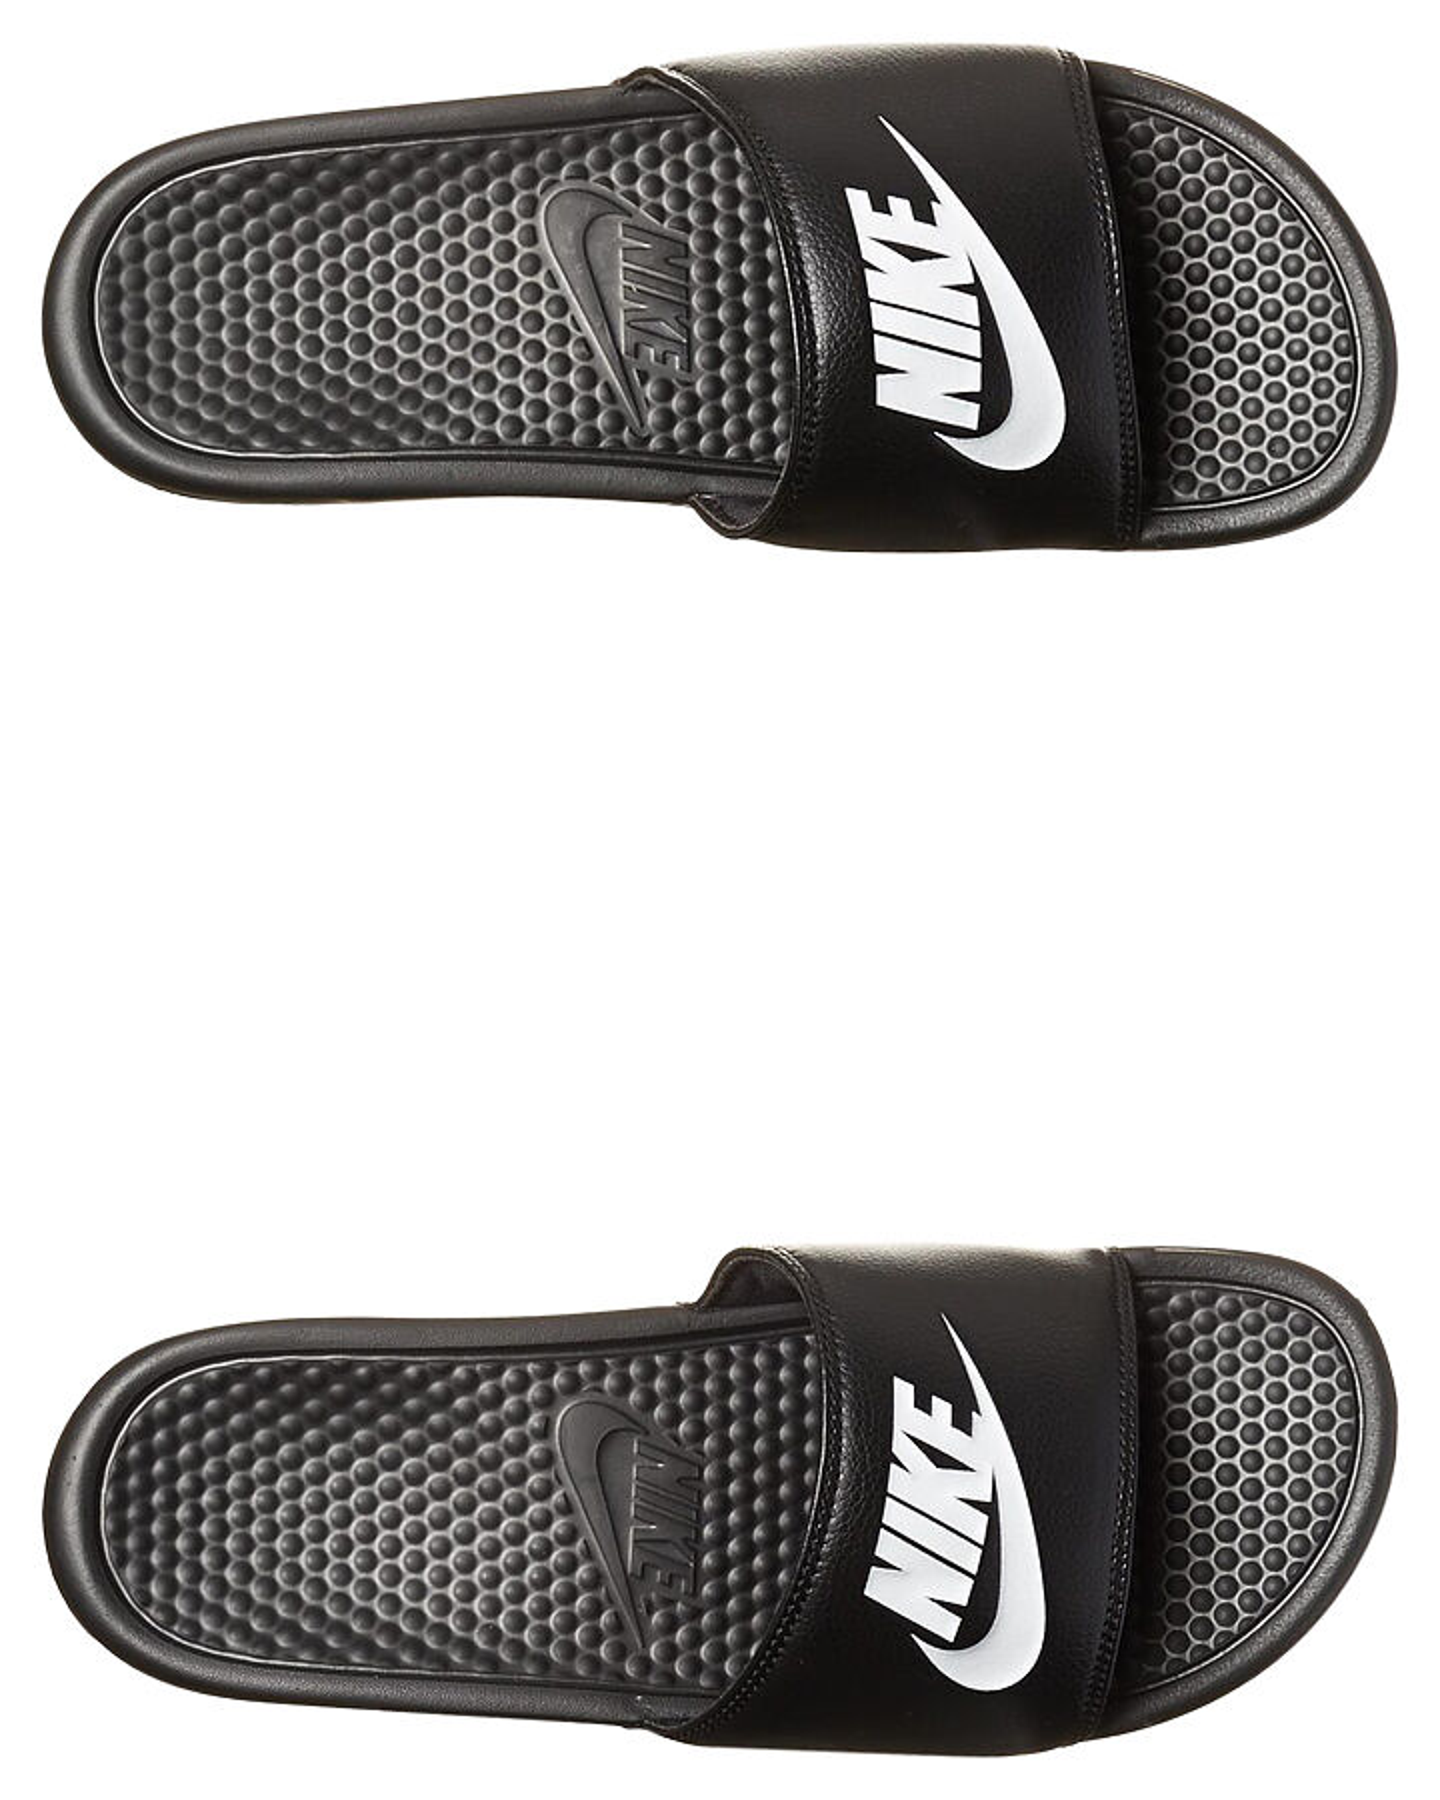 slides shoes